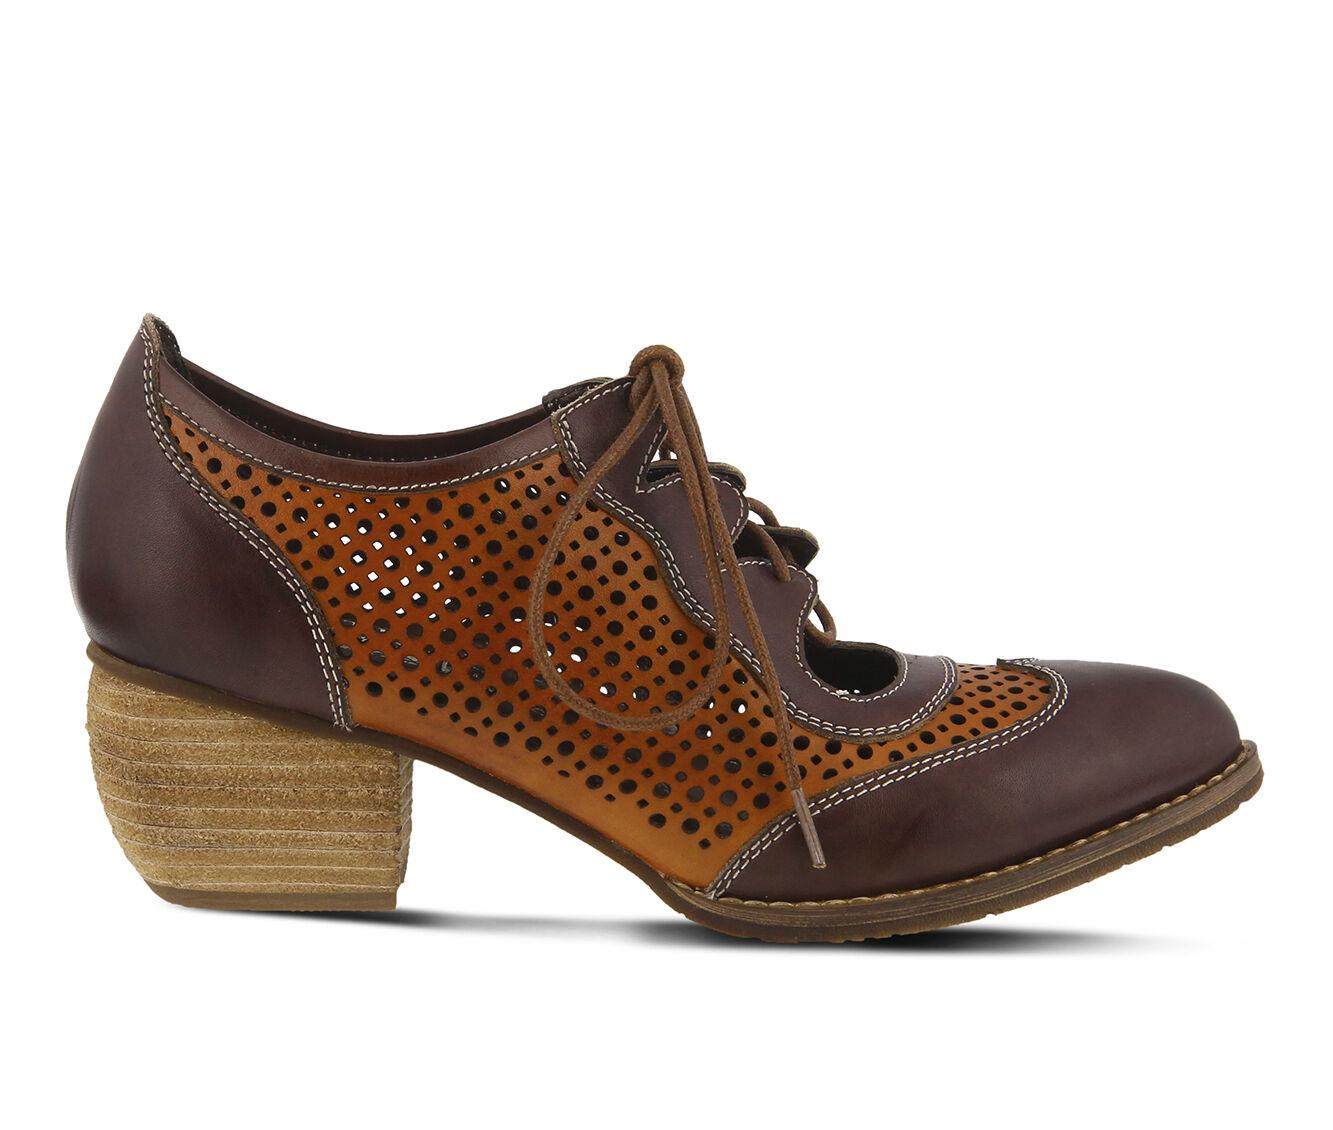 Women's L'ARTISTE Gabriel Shoes Brown